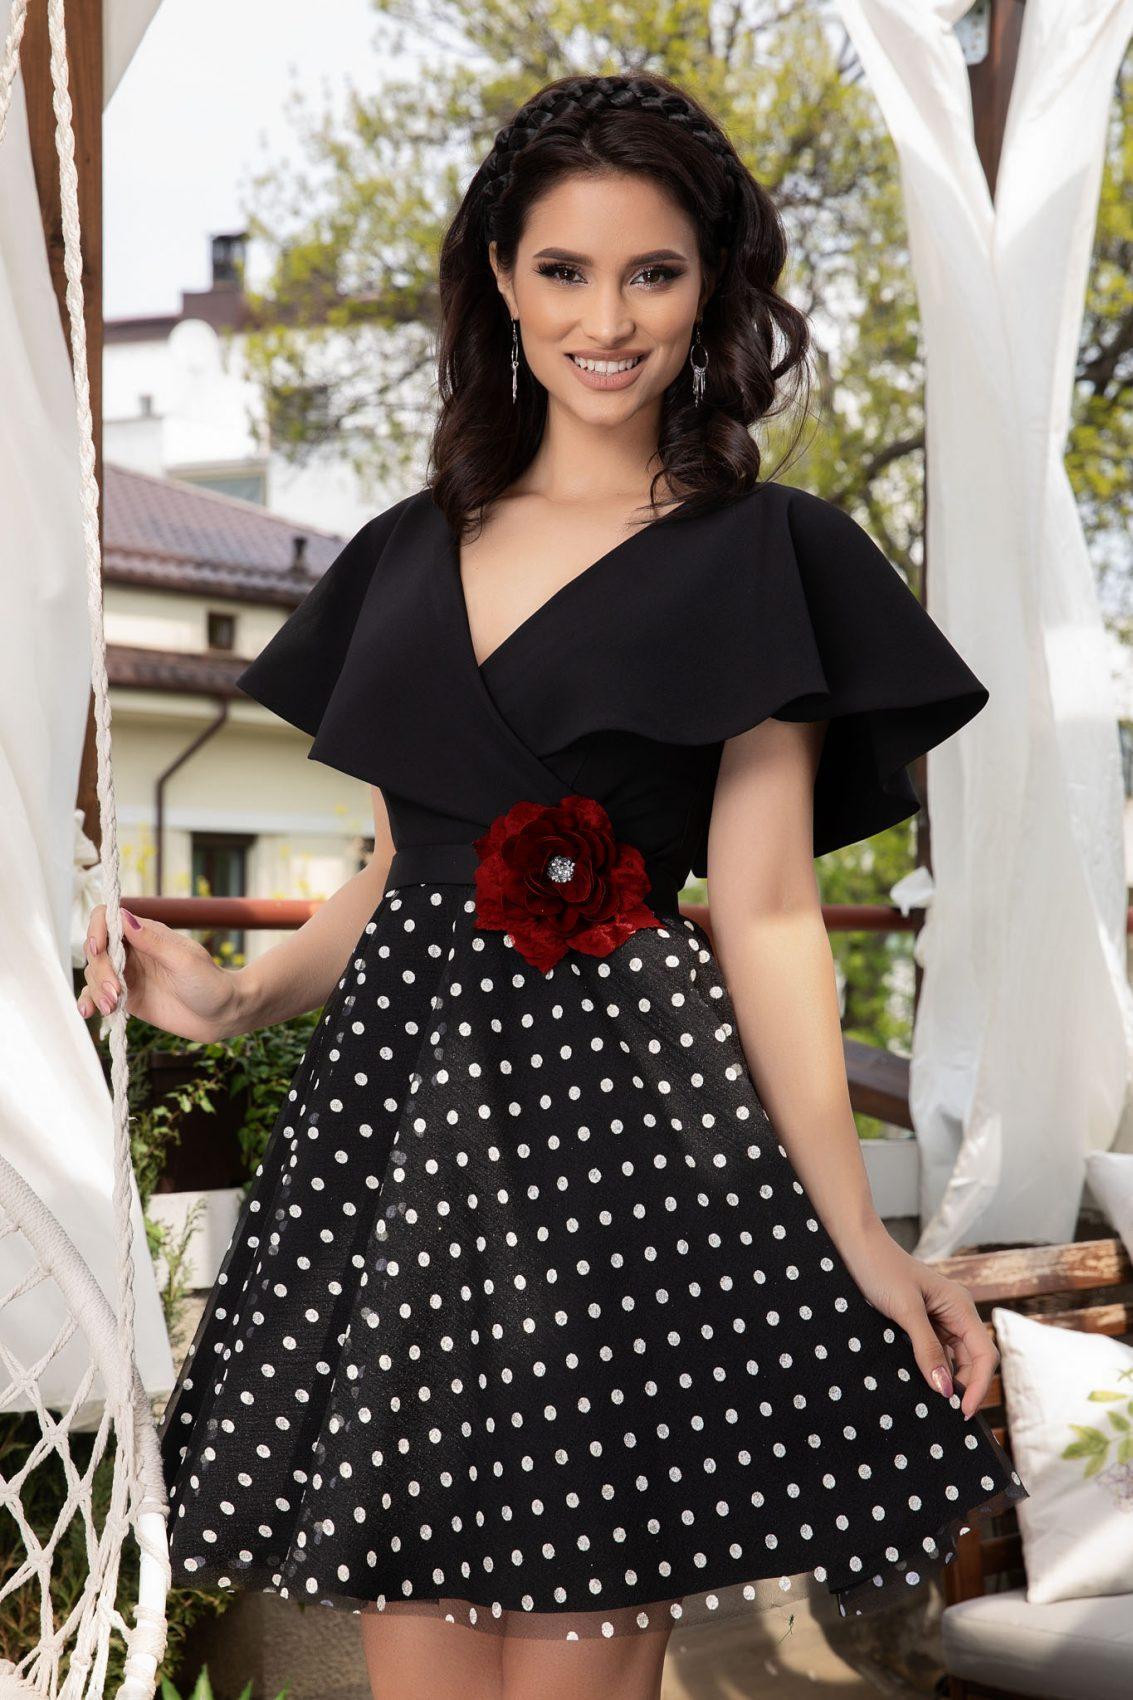 Girly Black Dress